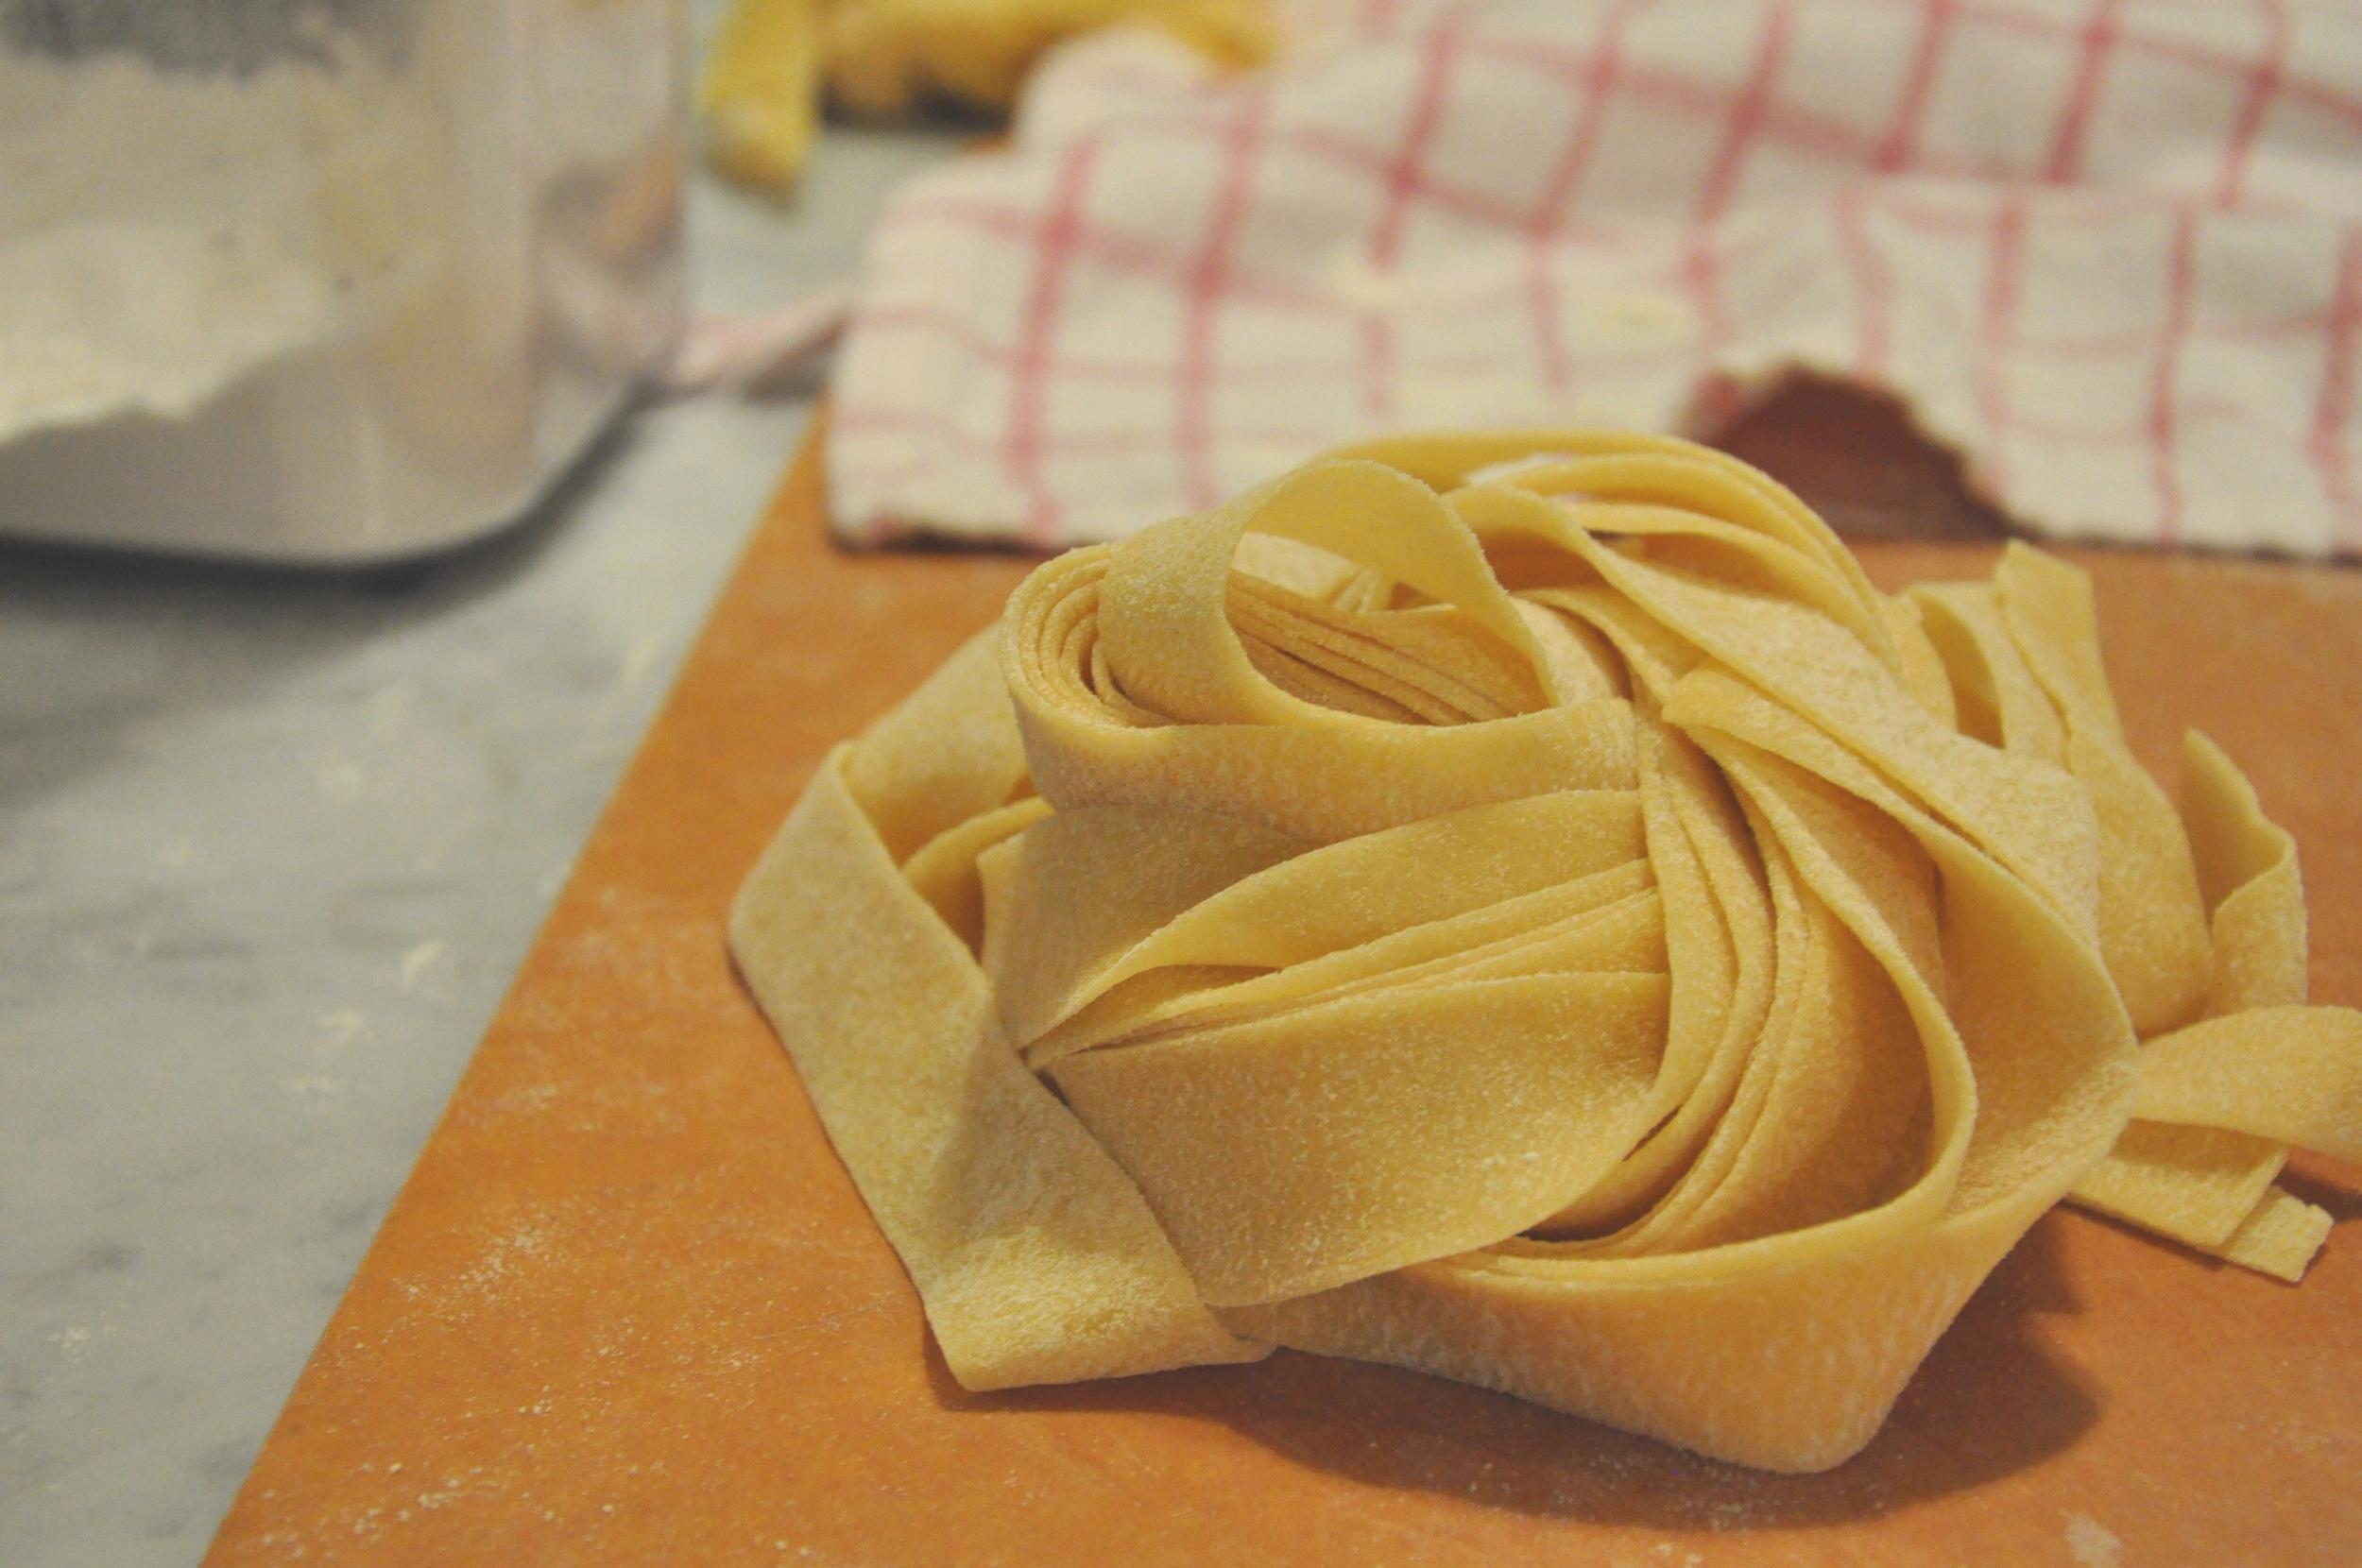 cutting_pasta3_cns.jpg